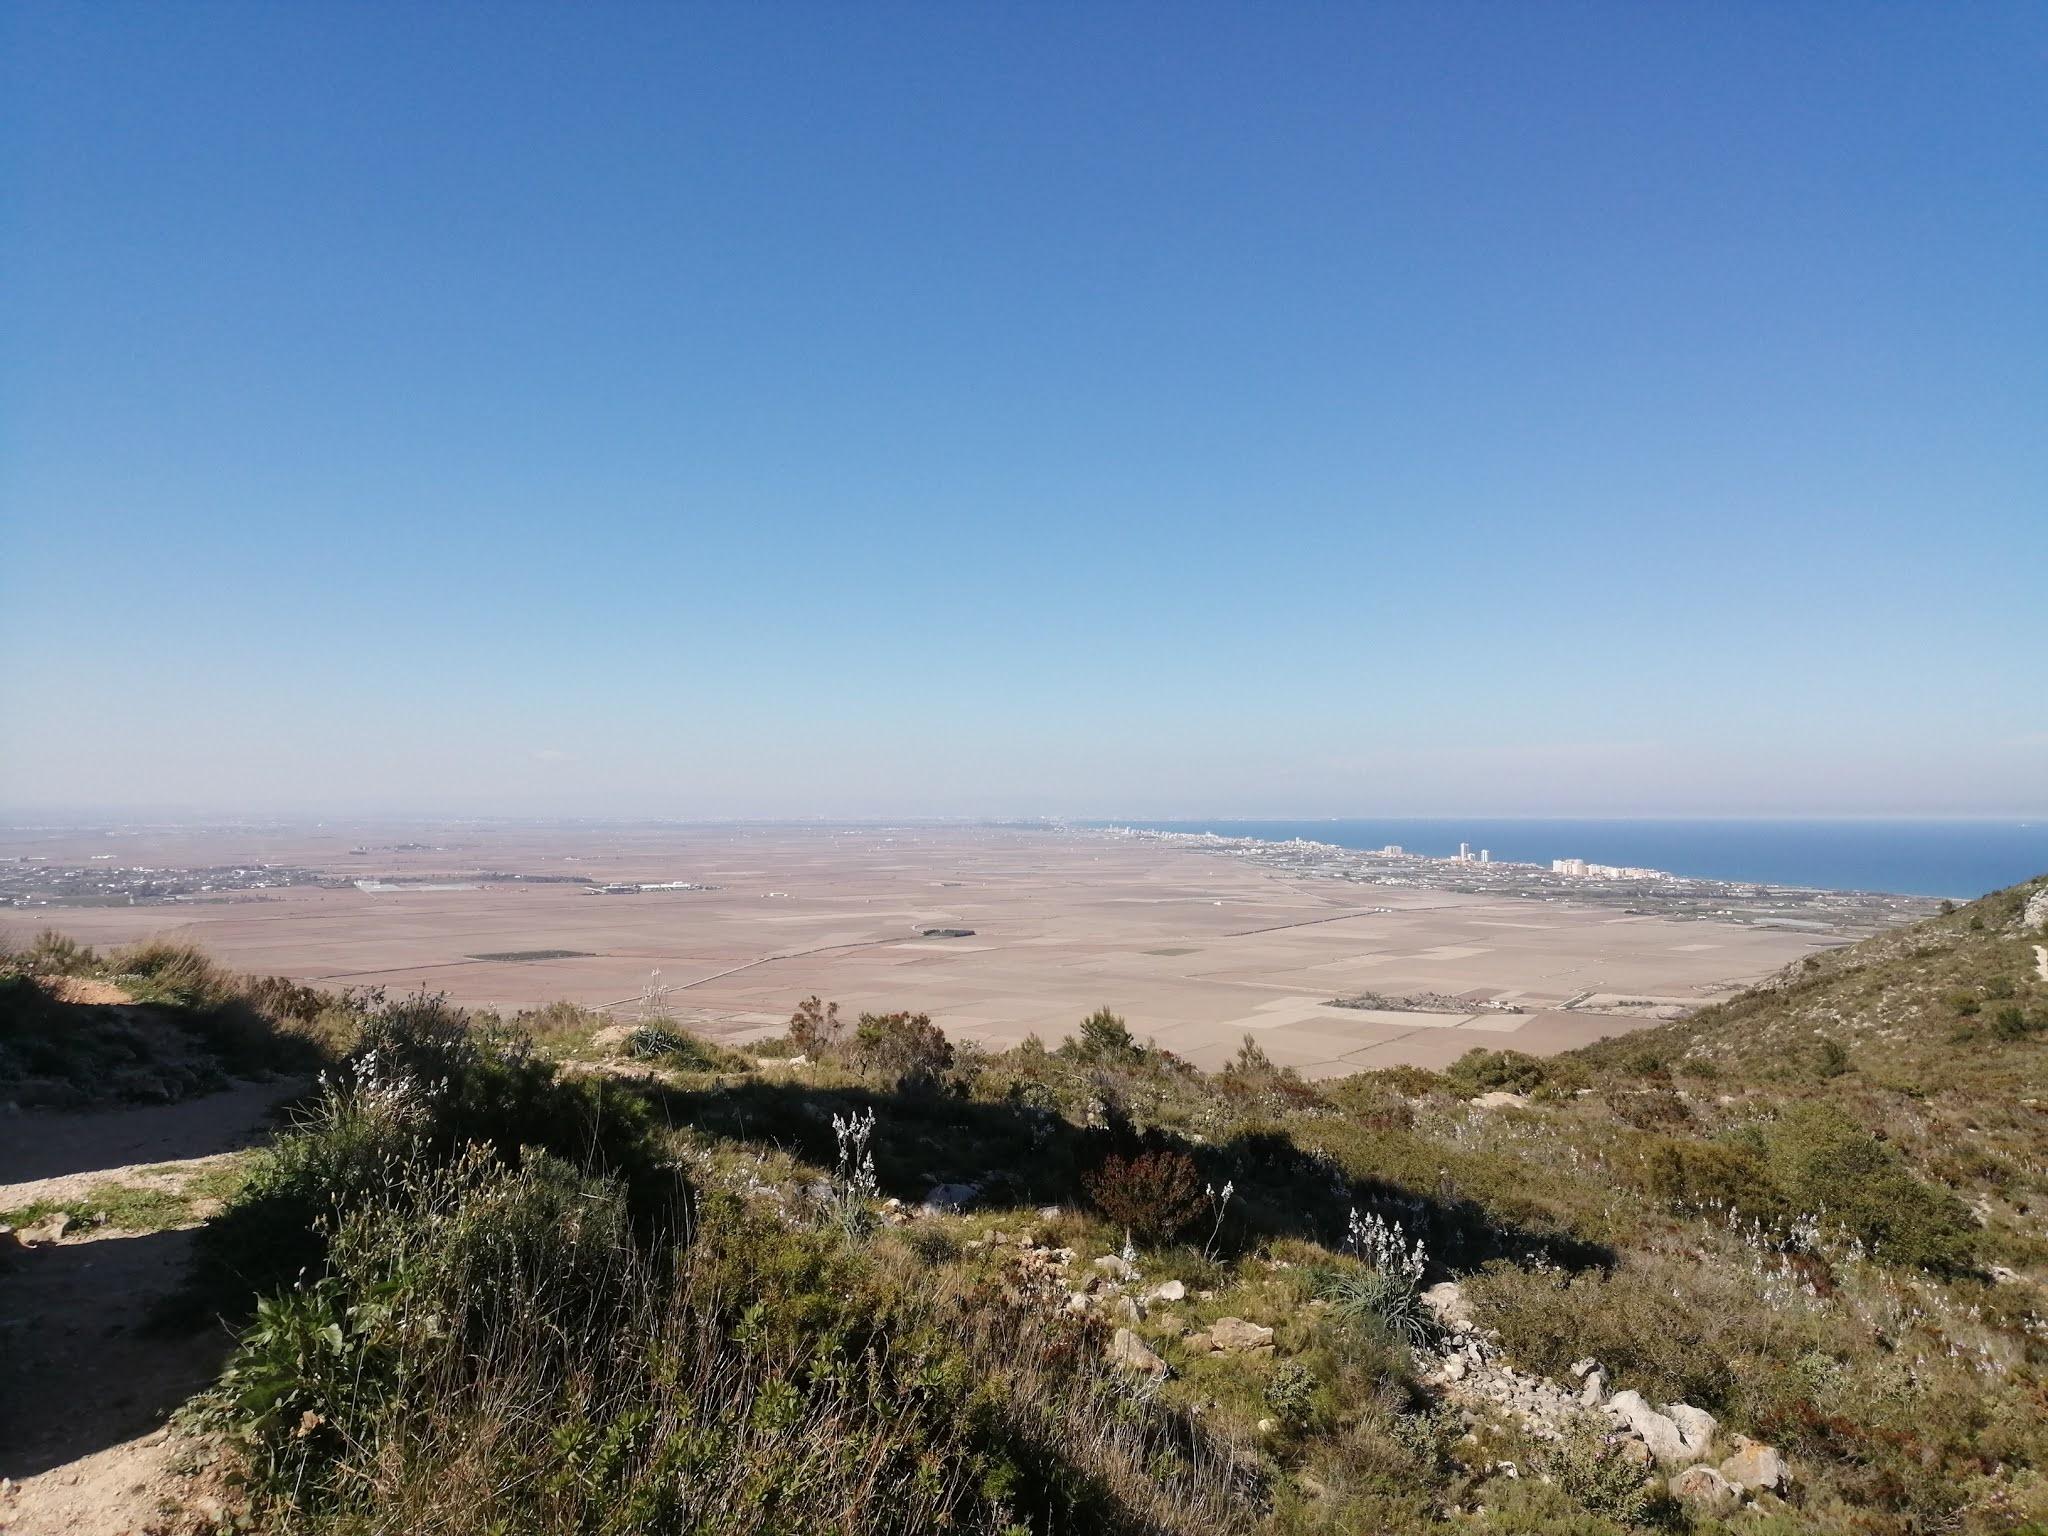 View north from la Bola de Cullera across the Albufera rice fields towards the city of Valencia